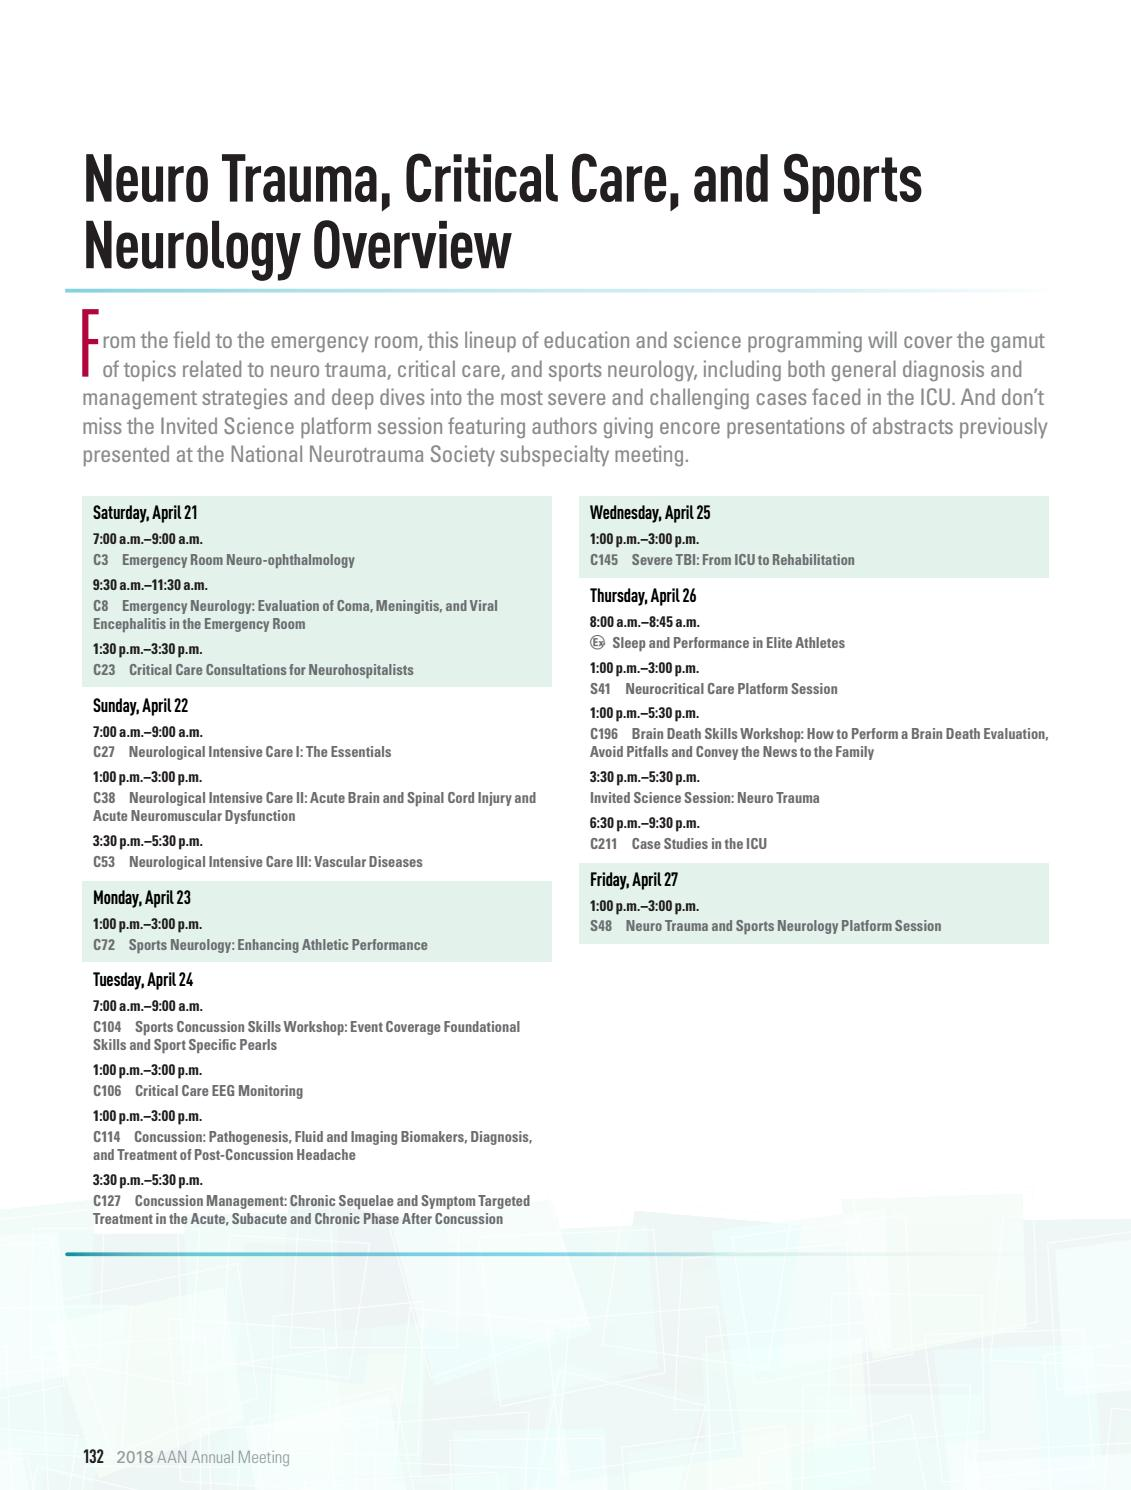 AAN 2018 Annual Meeting by American Academy of Neurology - issuu